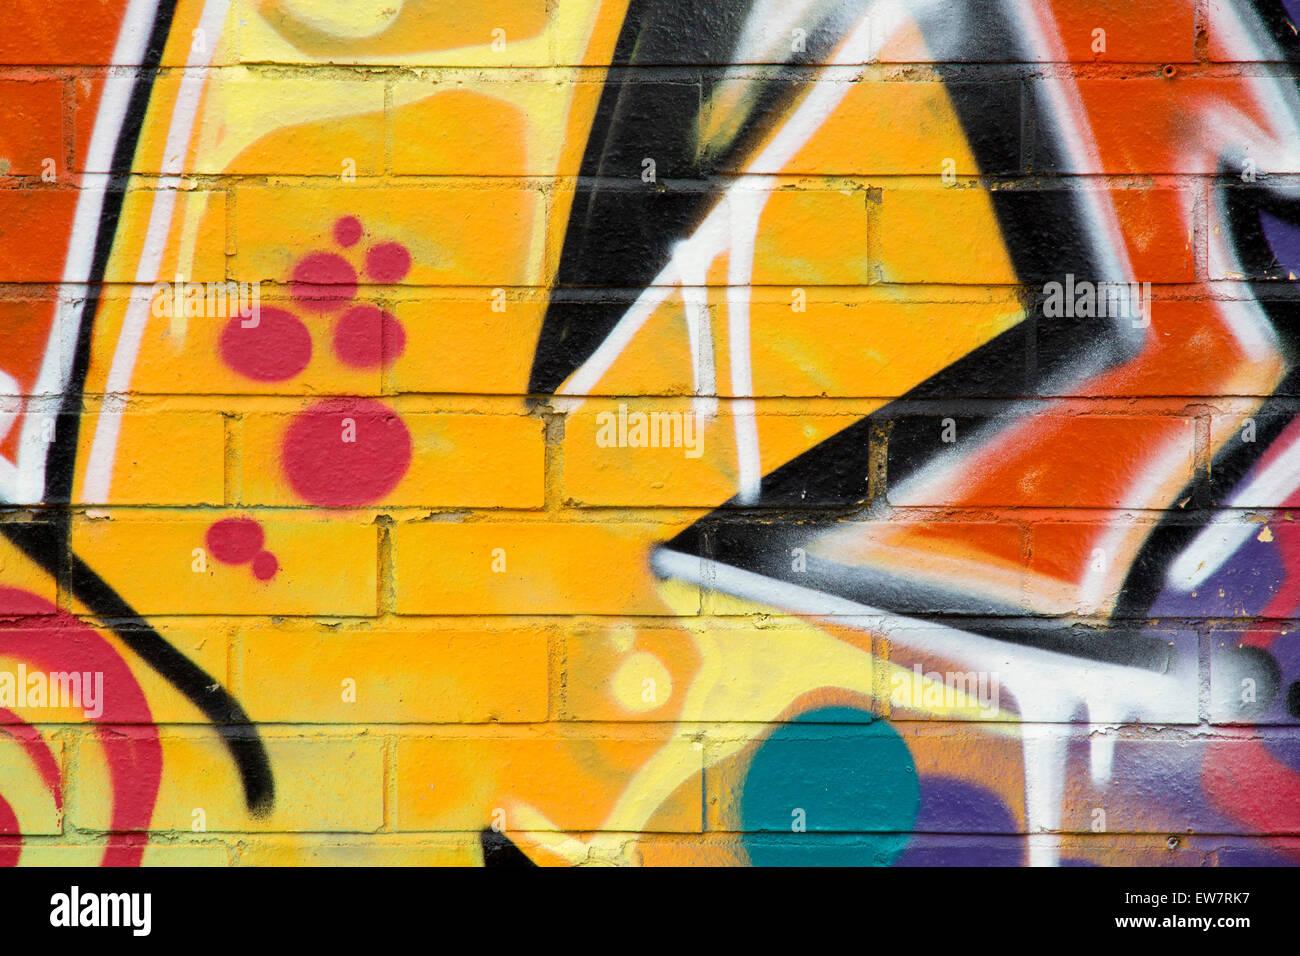 BRIGHTON - MAY 22, 2015. Street art graffiti on an old brick wall in ...